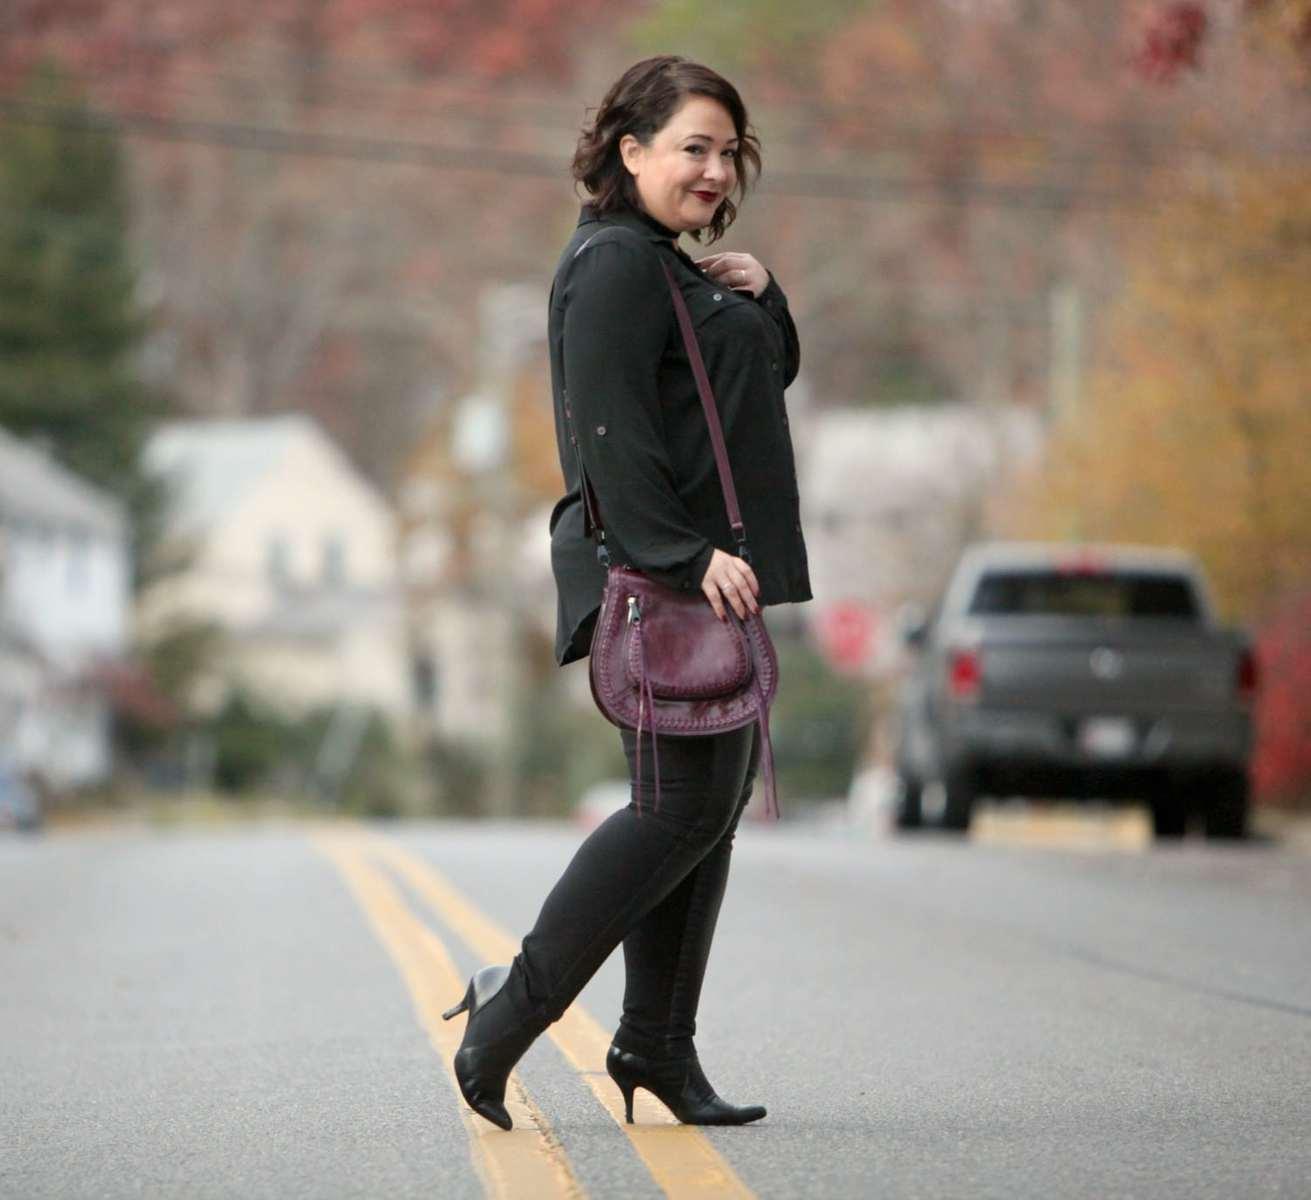 Wardrobe Oxygen. over 40 fashion blogger featuring Rebecca Minkoff Vanity bag and NARS Bette lipstick